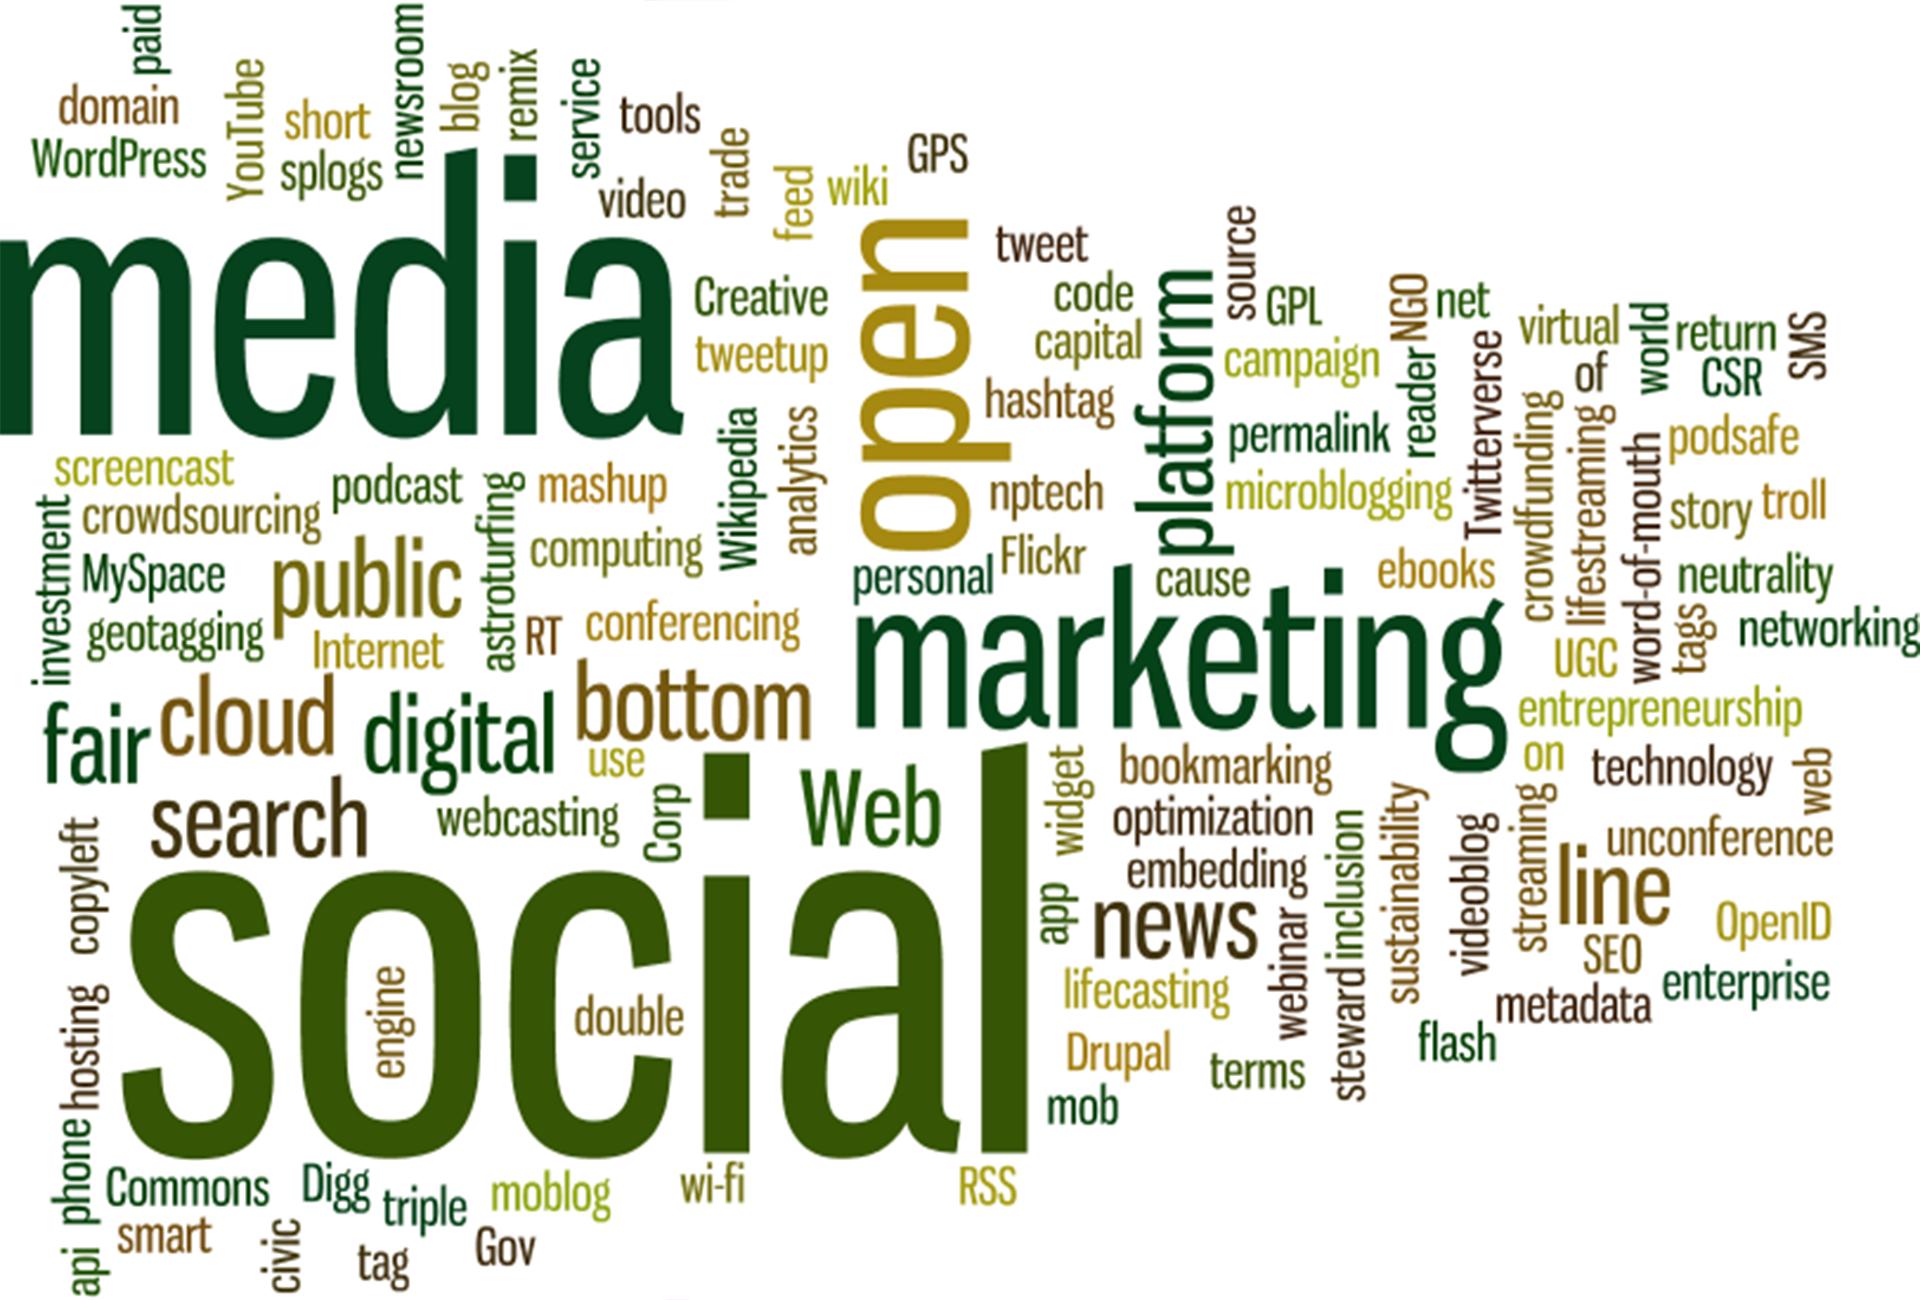 HappyWeb.ro | Marketing online | Design web, dezvoltare web, marketing online